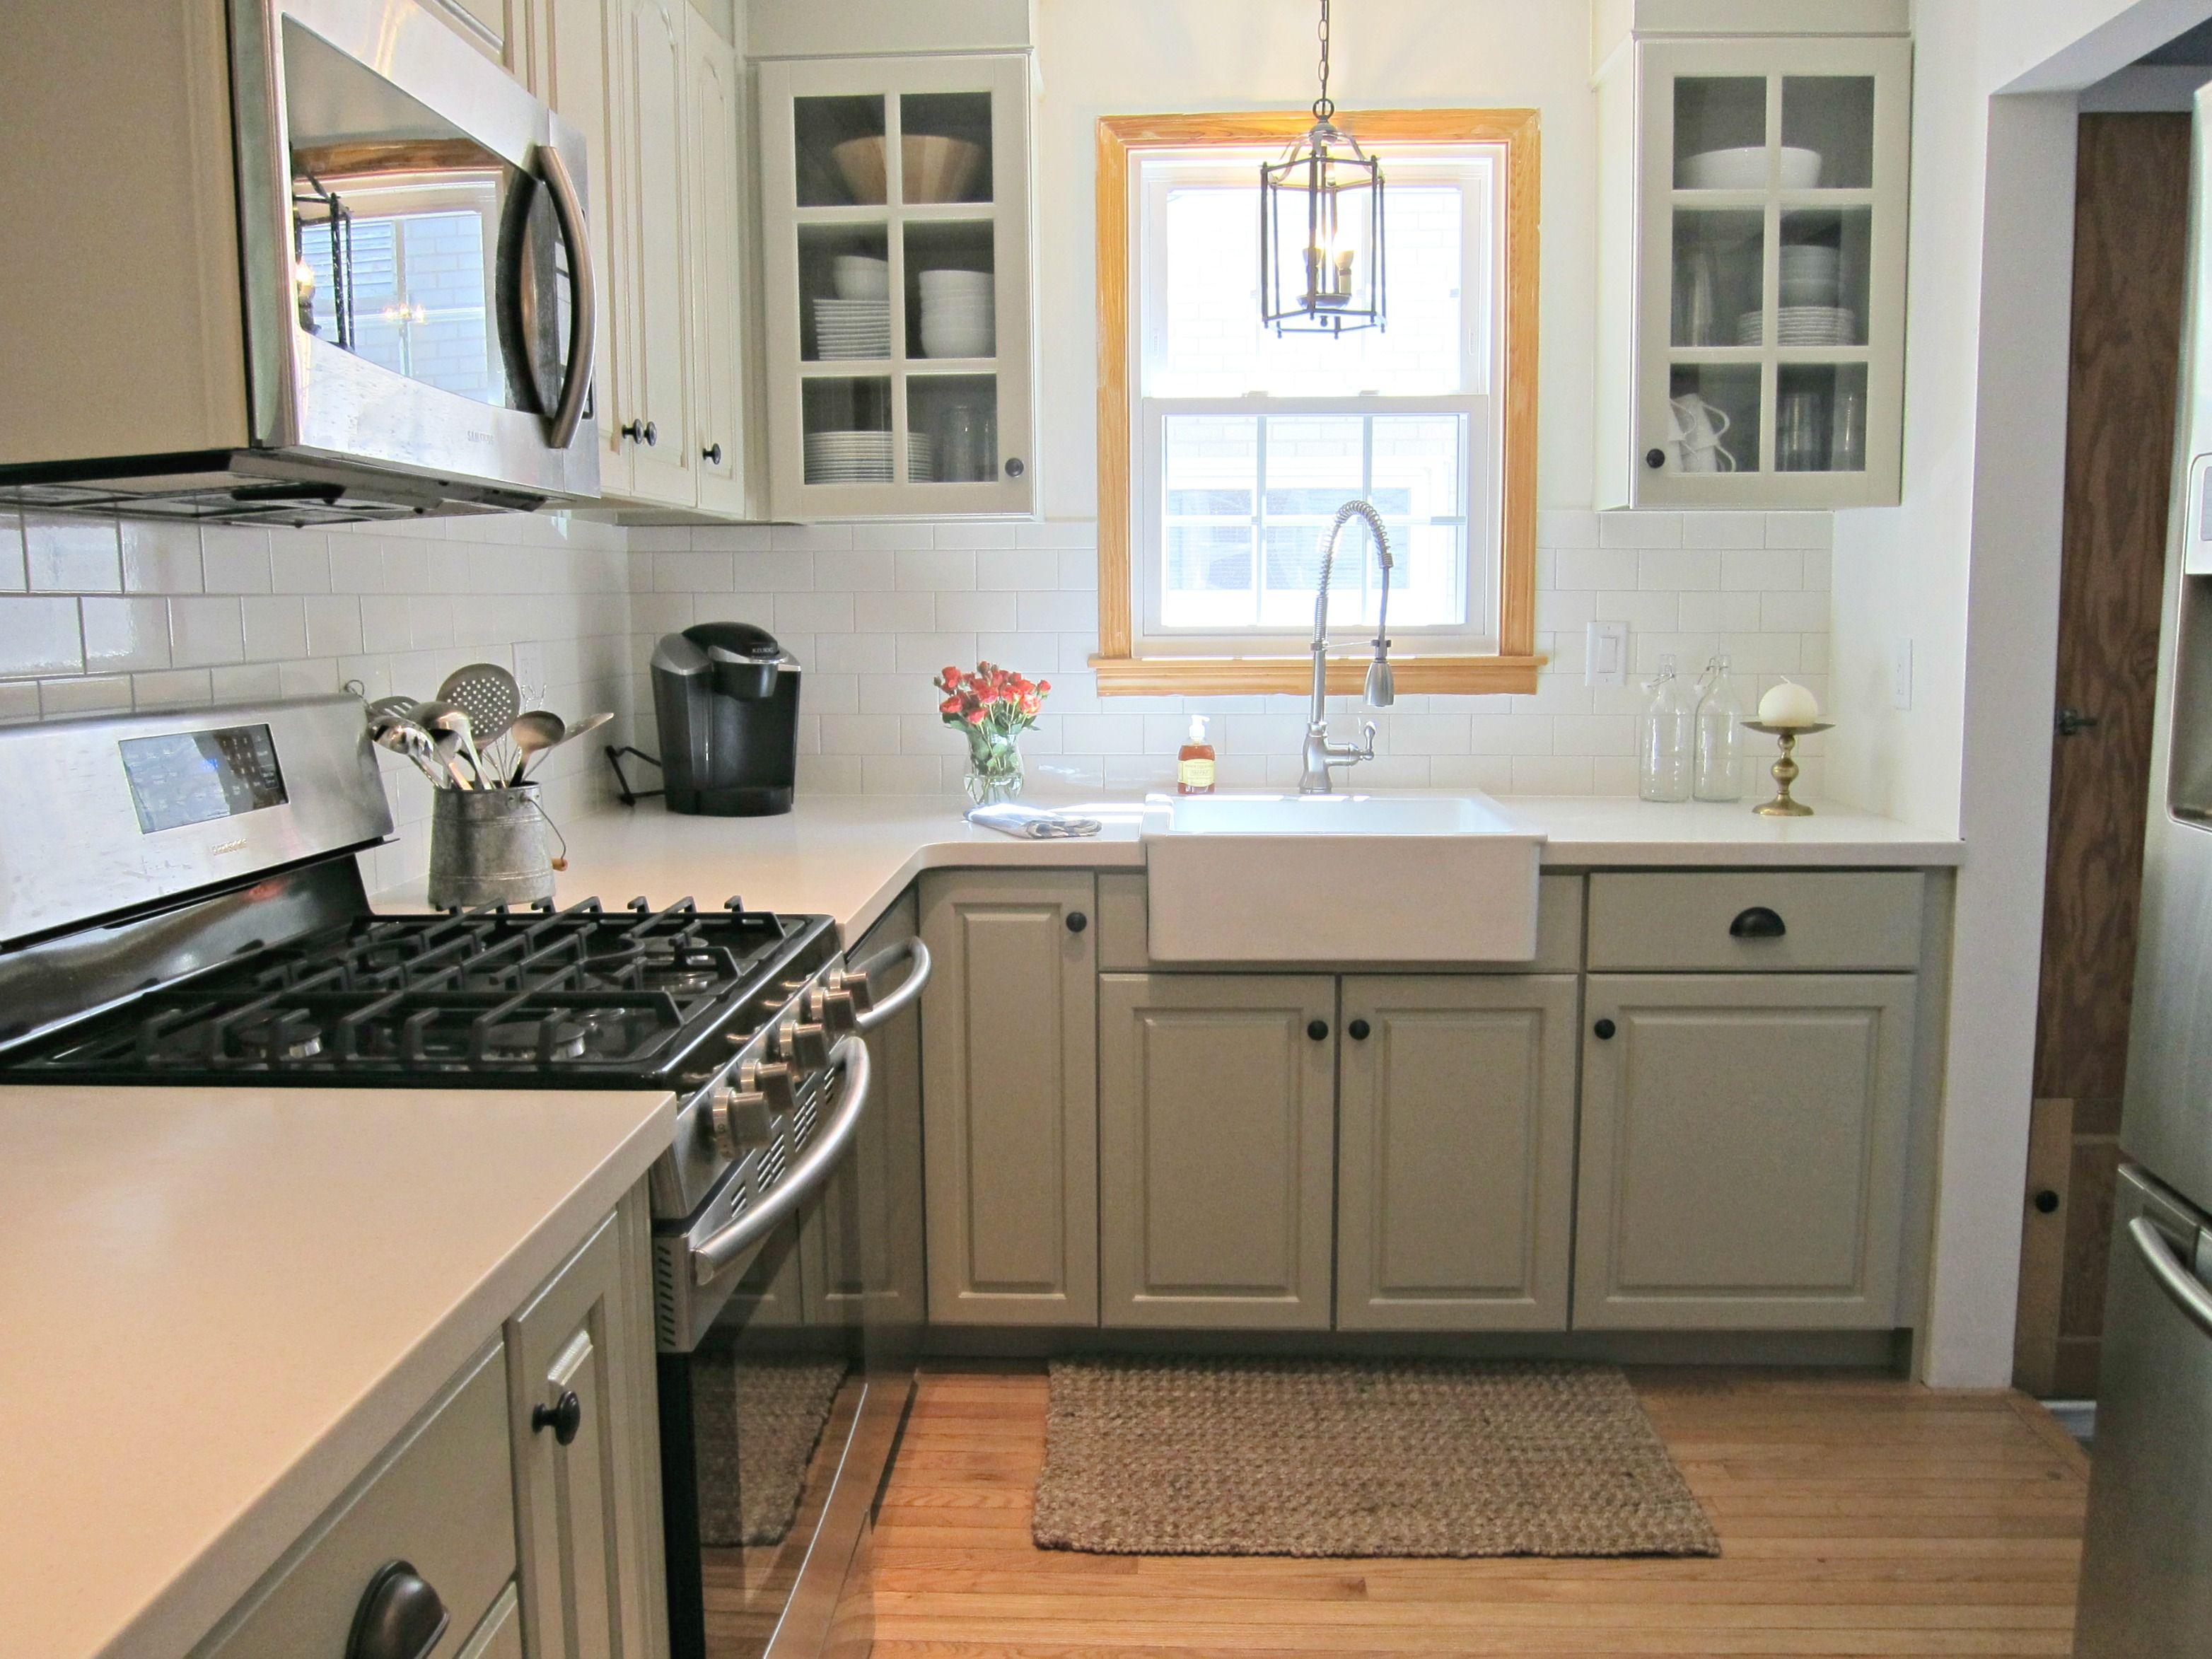 Benjamin Moore Antique Glass Corian Linen Counters Benjamin Moore Senora Gray Cabinets White